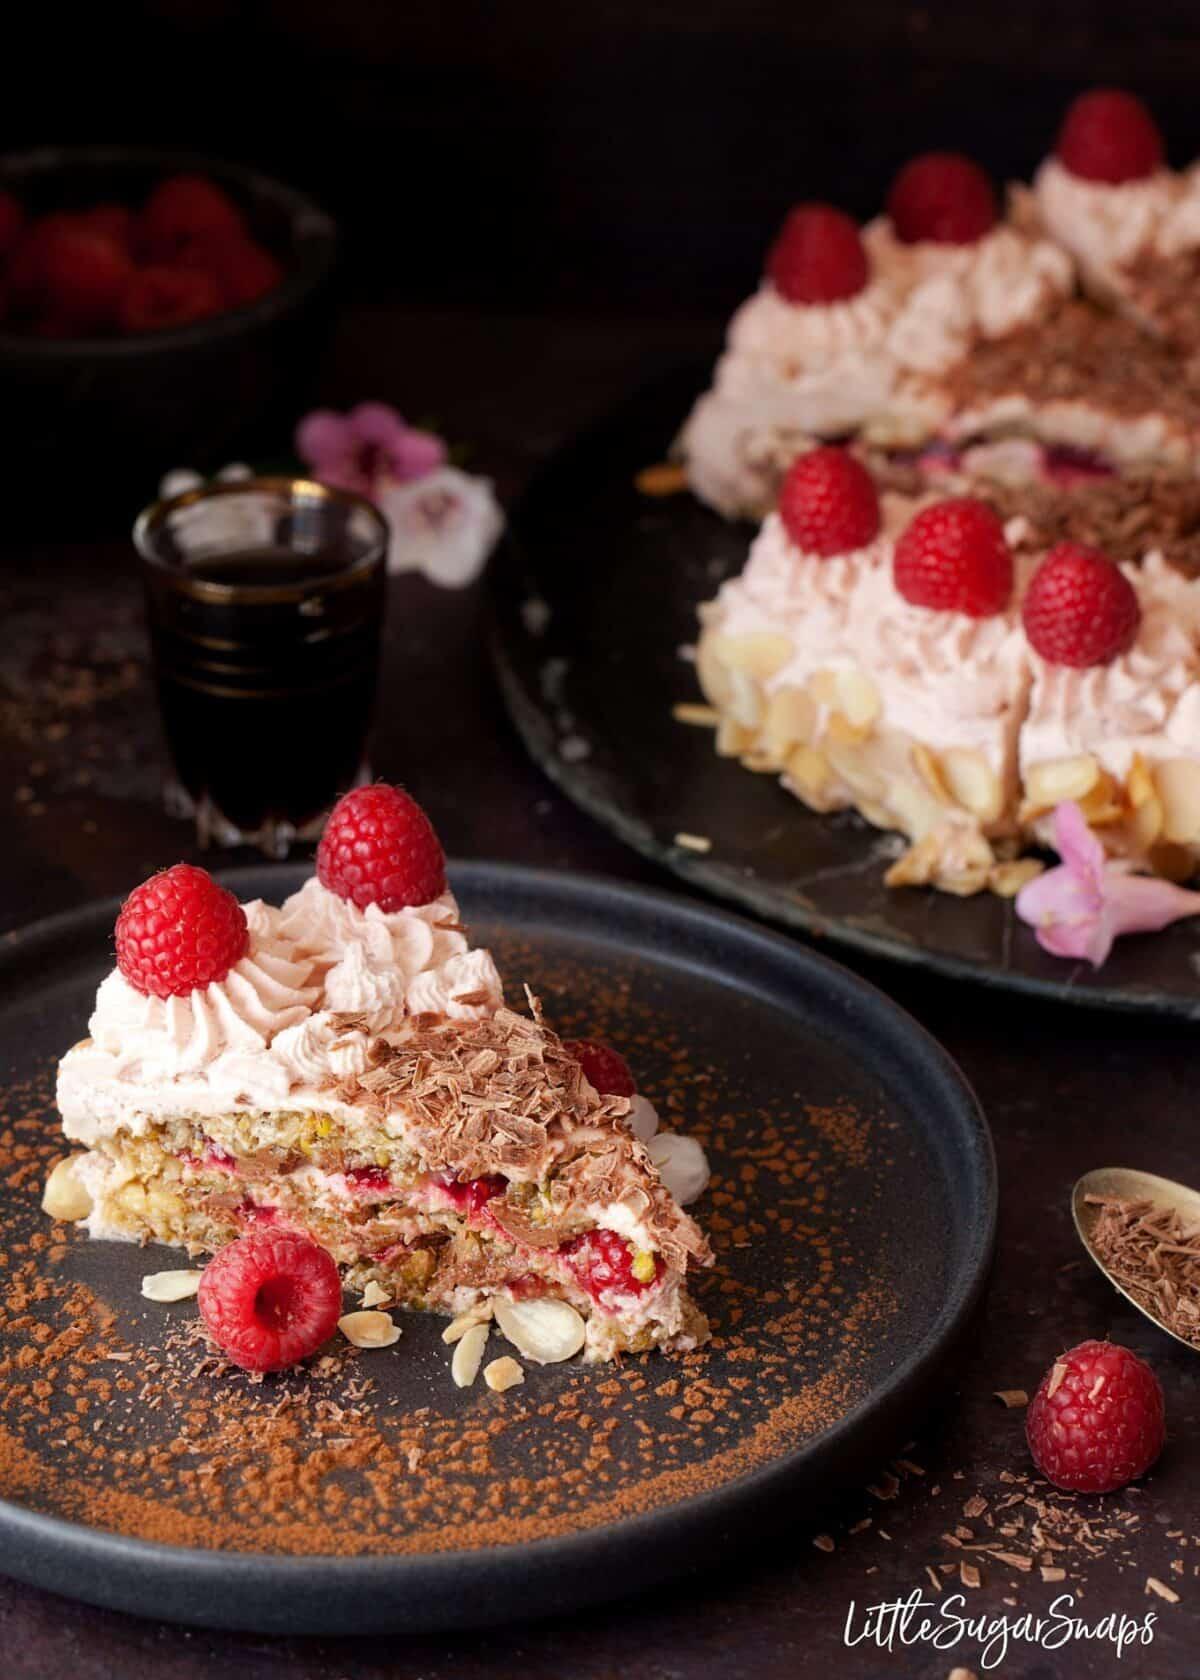 Chocolate Raspberry Dacquoise Cake